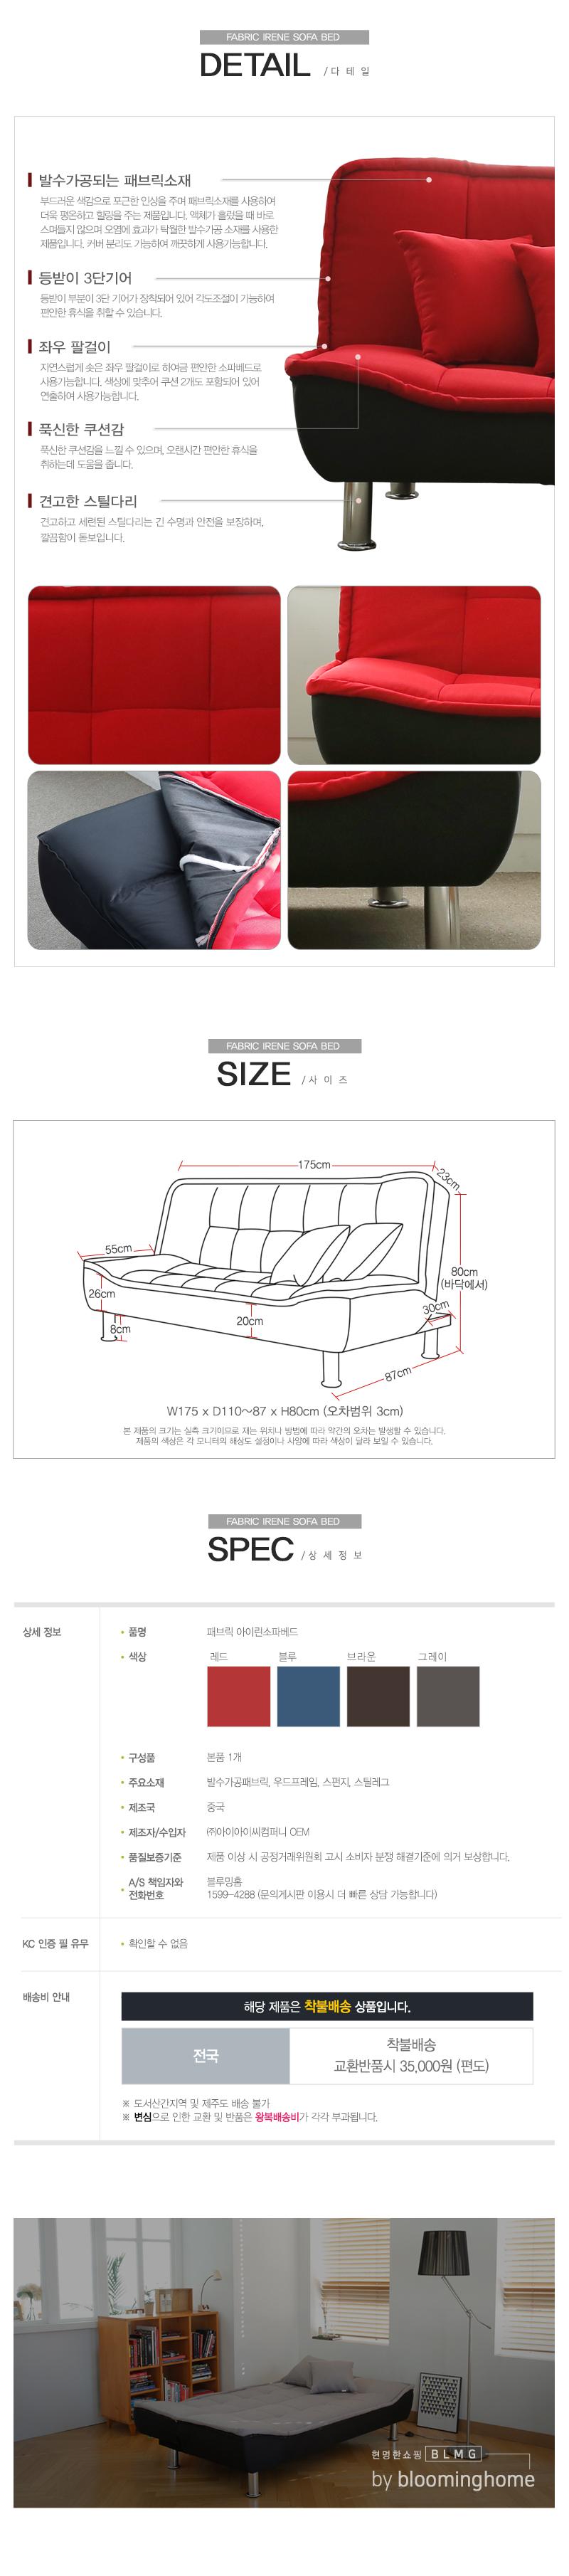 Home furniture sofa - Upgrade Your Life 11